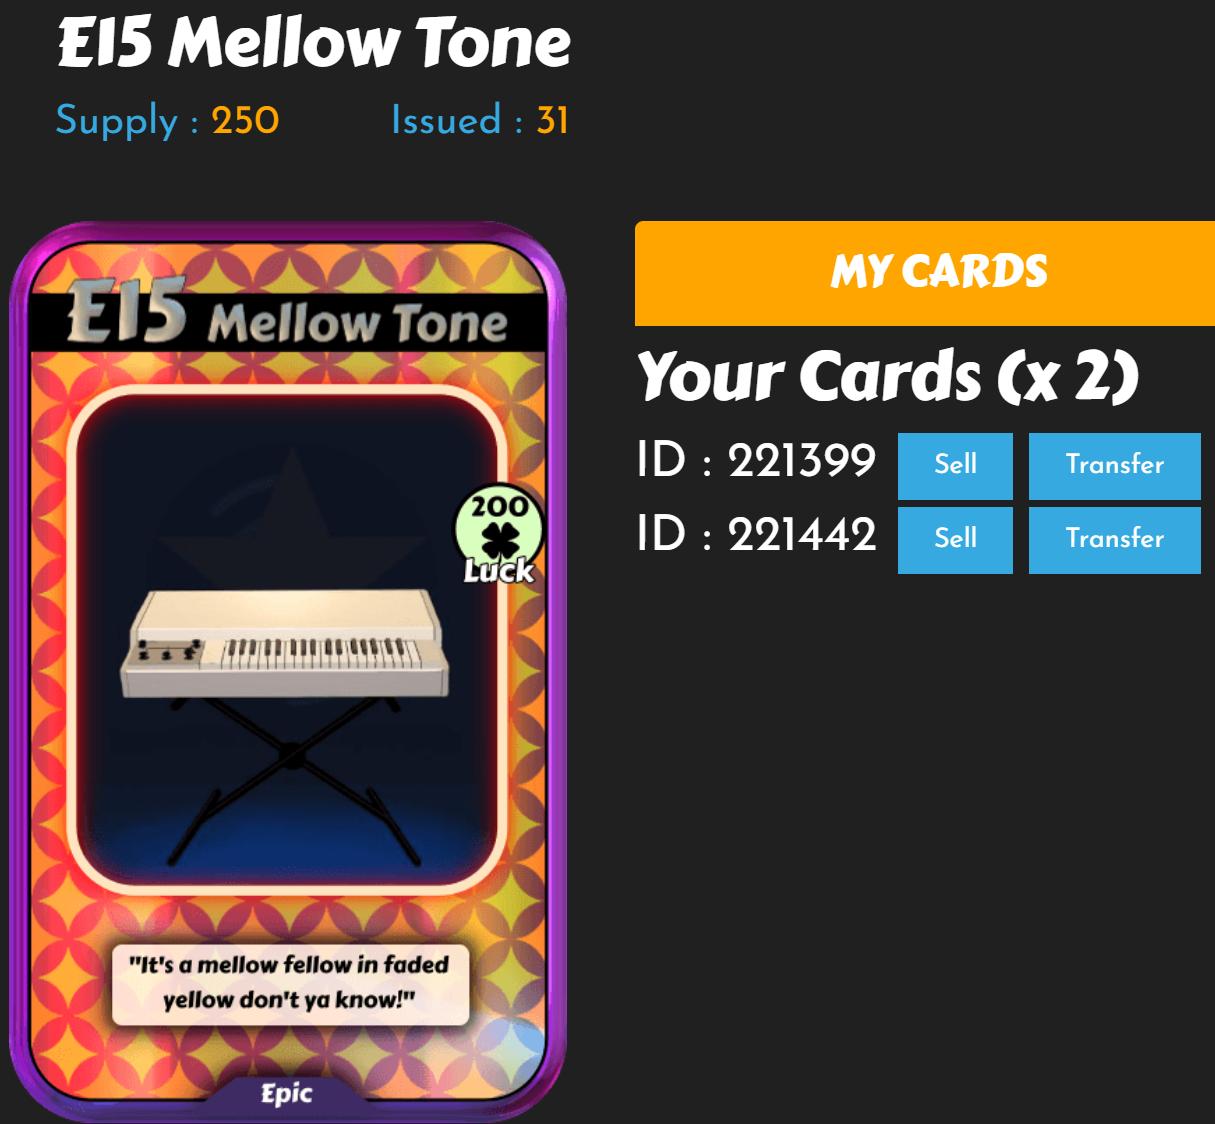 mellowtone.png